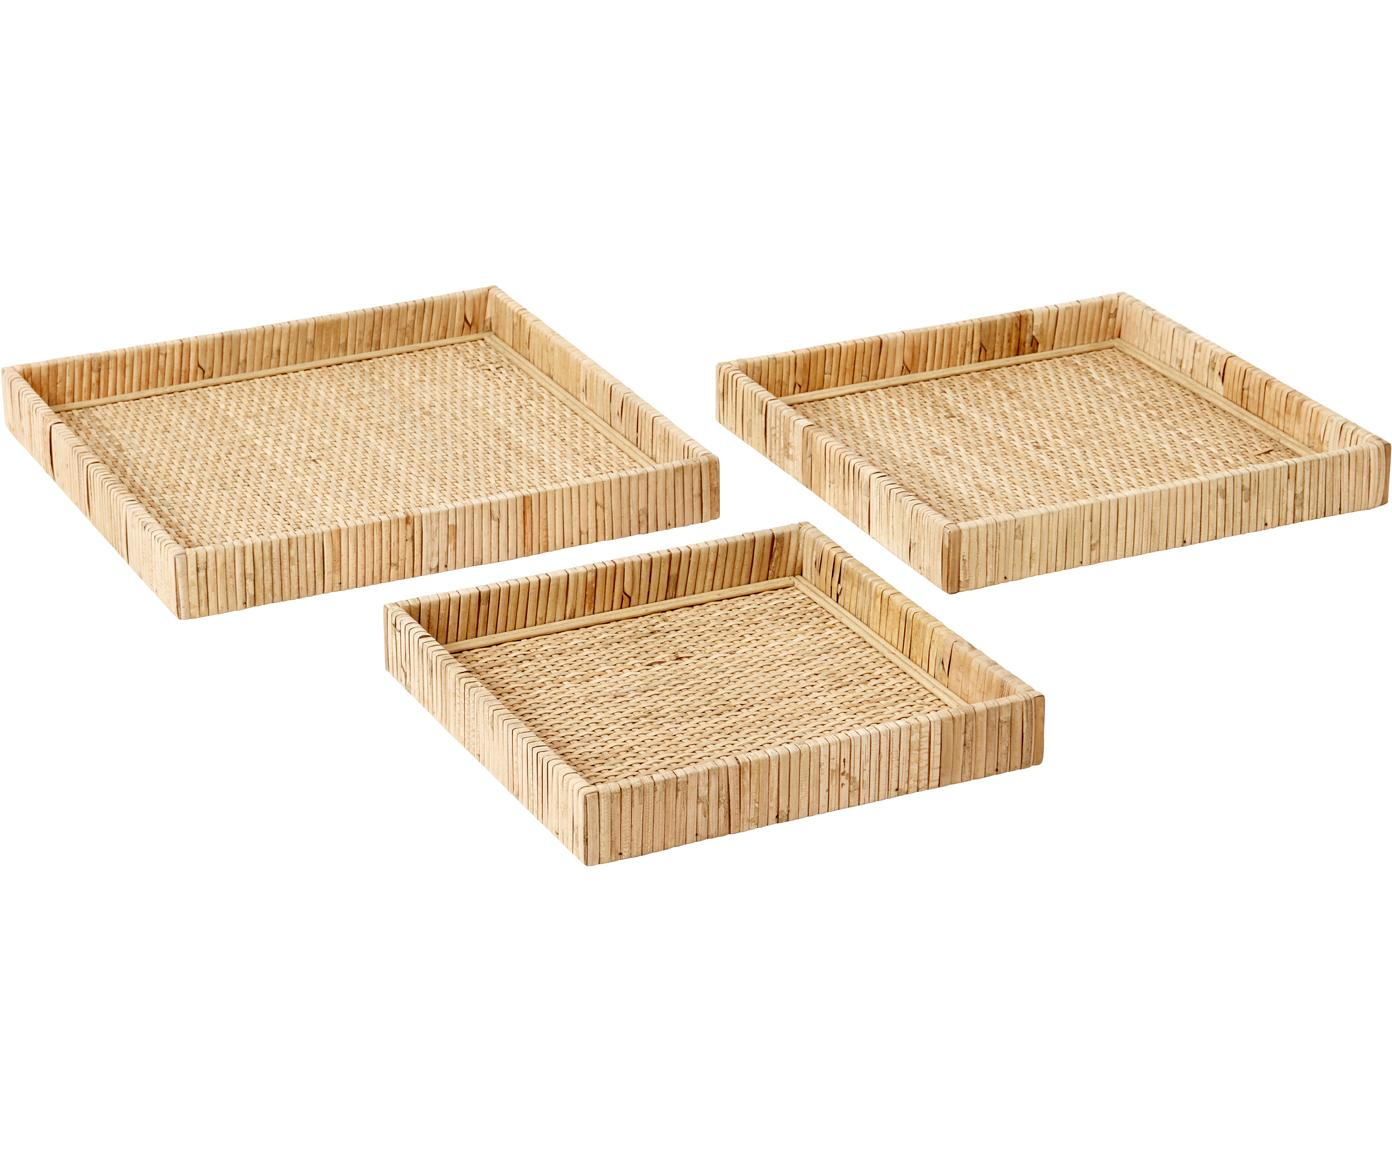 Set de bandejas de ratán Fuji, 3pzas., Ratán, madera contrachapada, Ratán, Tamaños diferentes